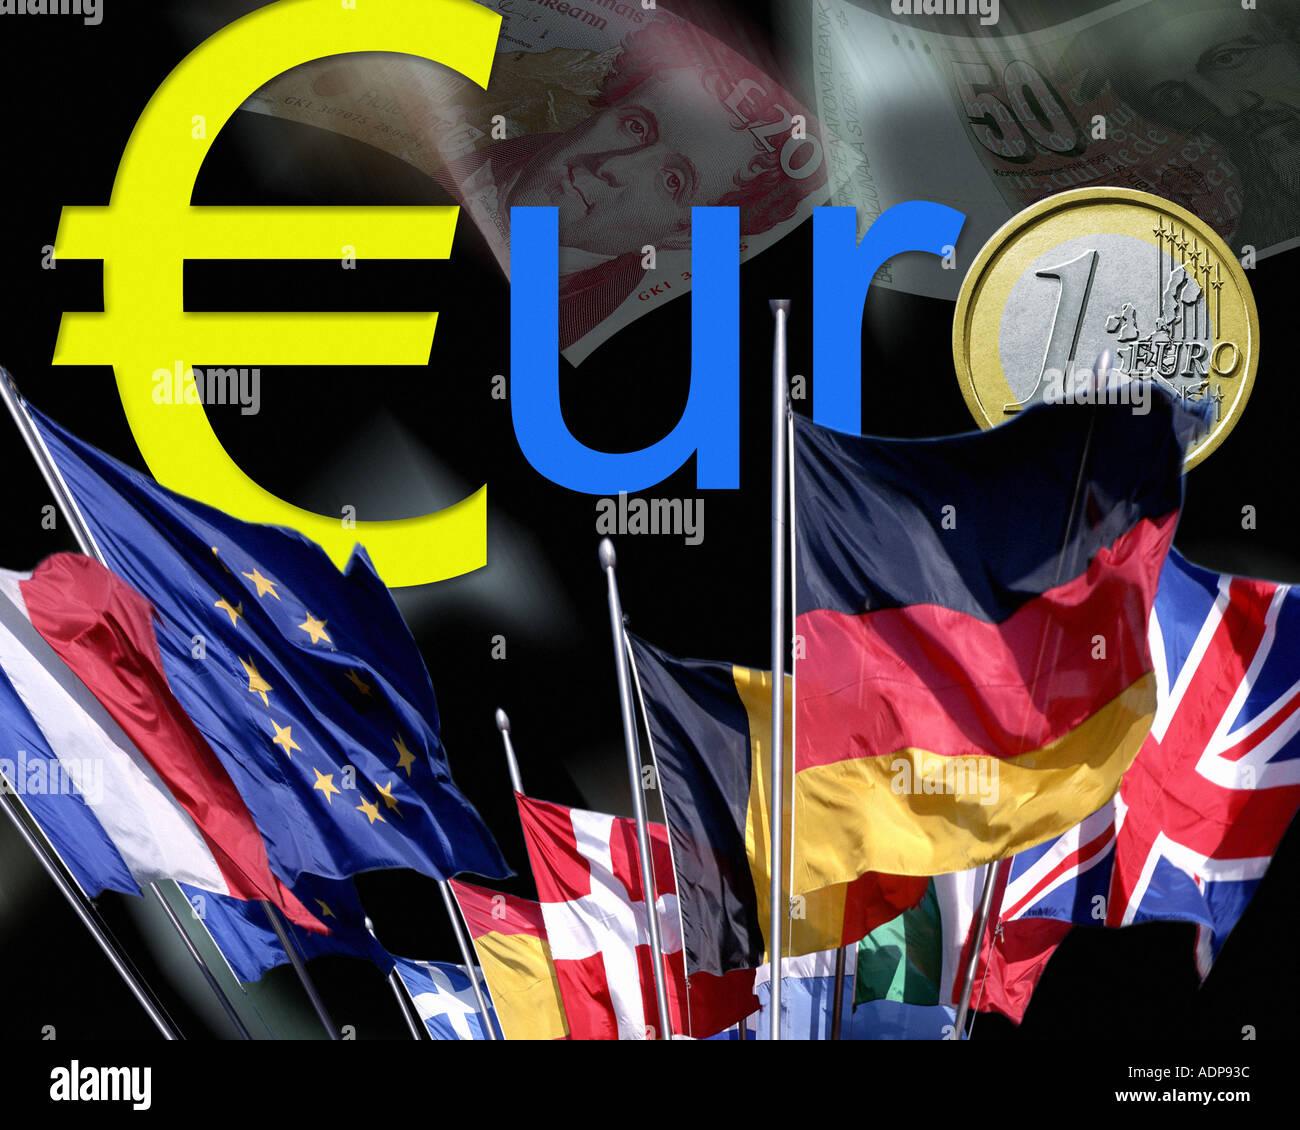 CONCEPT: Europe Photo Stock